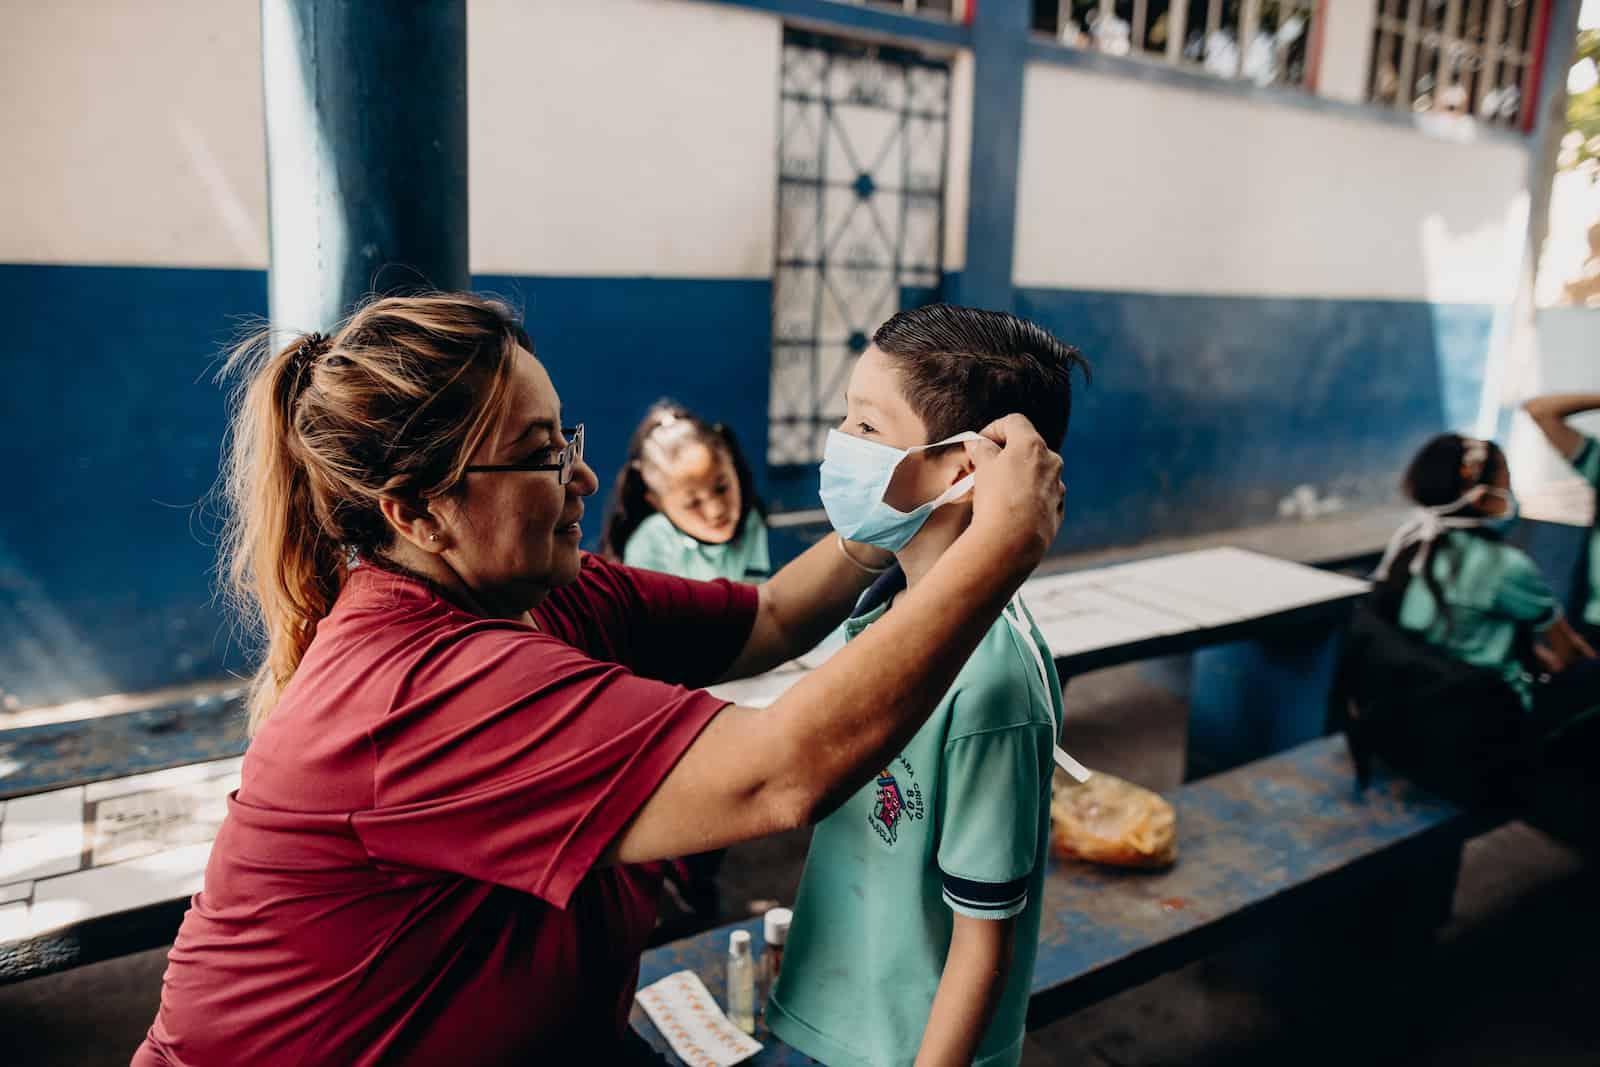 A woman secures a face mask on a boy.